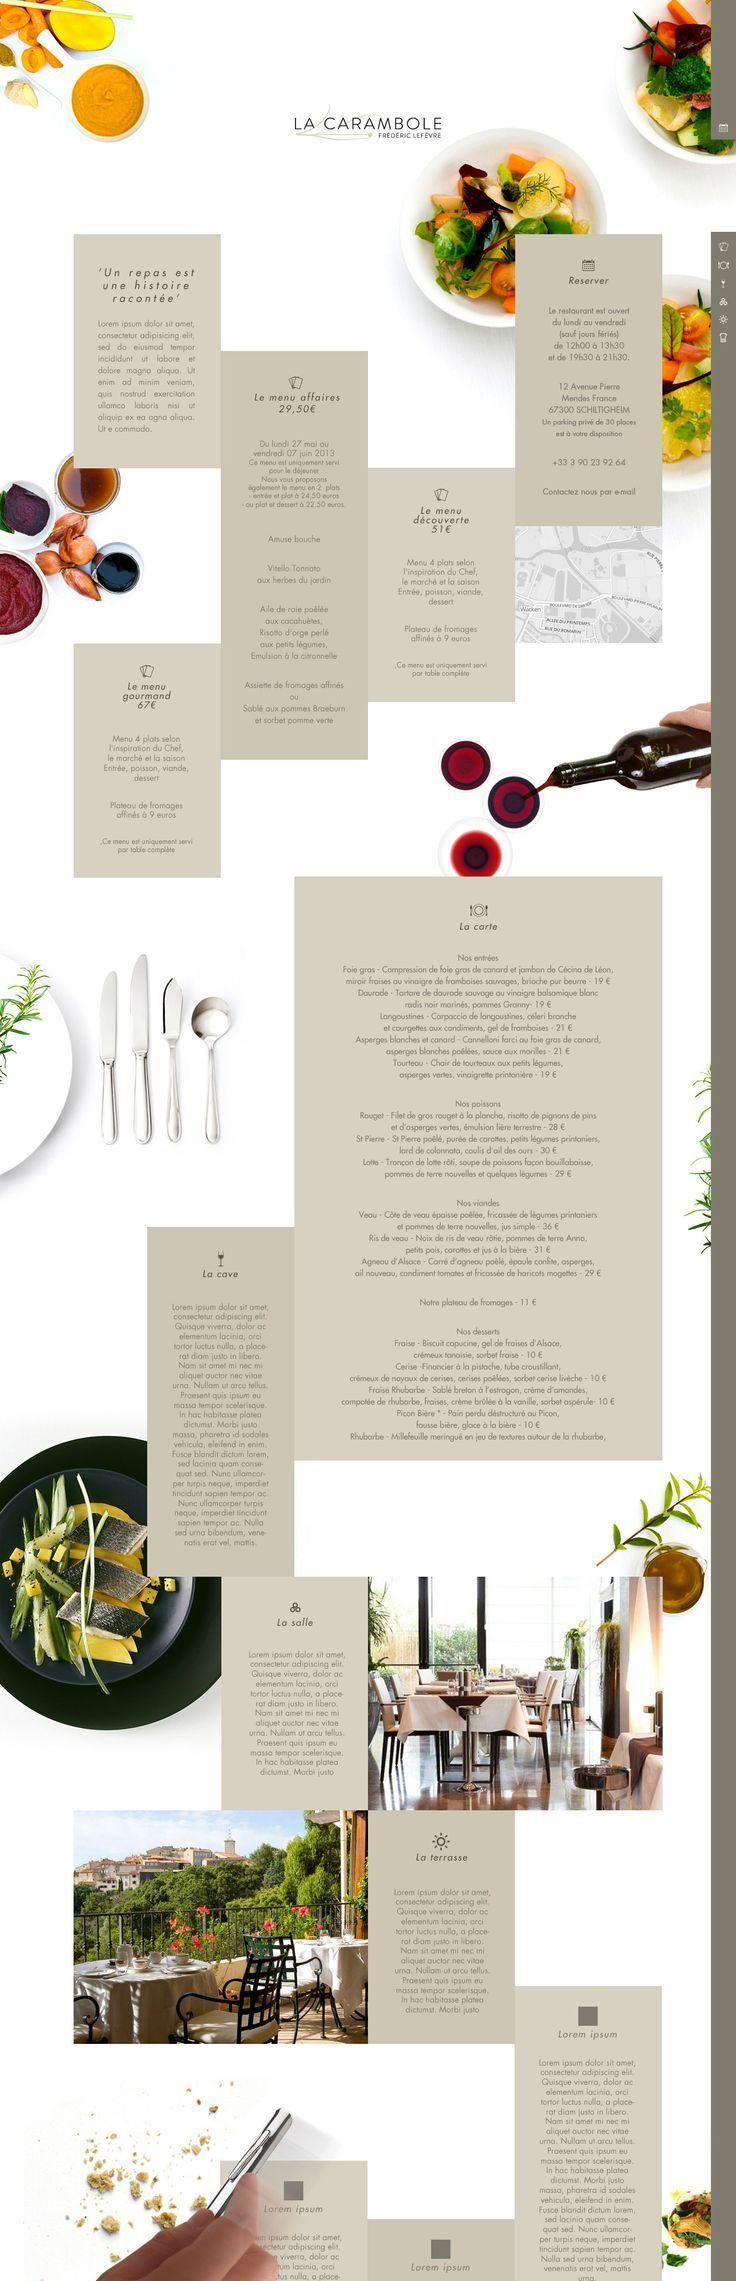 Web design inspiration website designs ui and